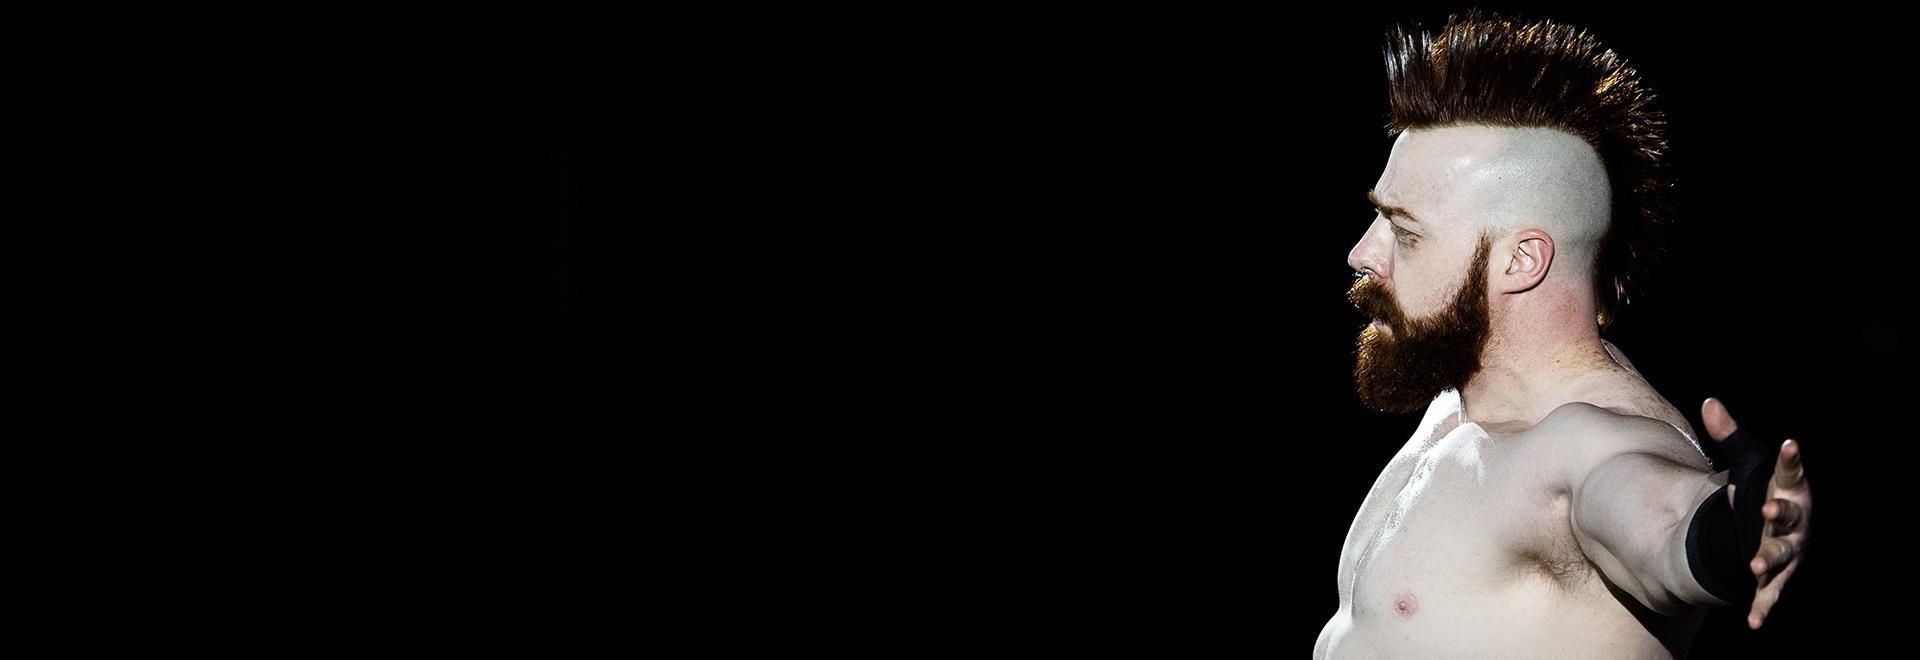 Ep. 49